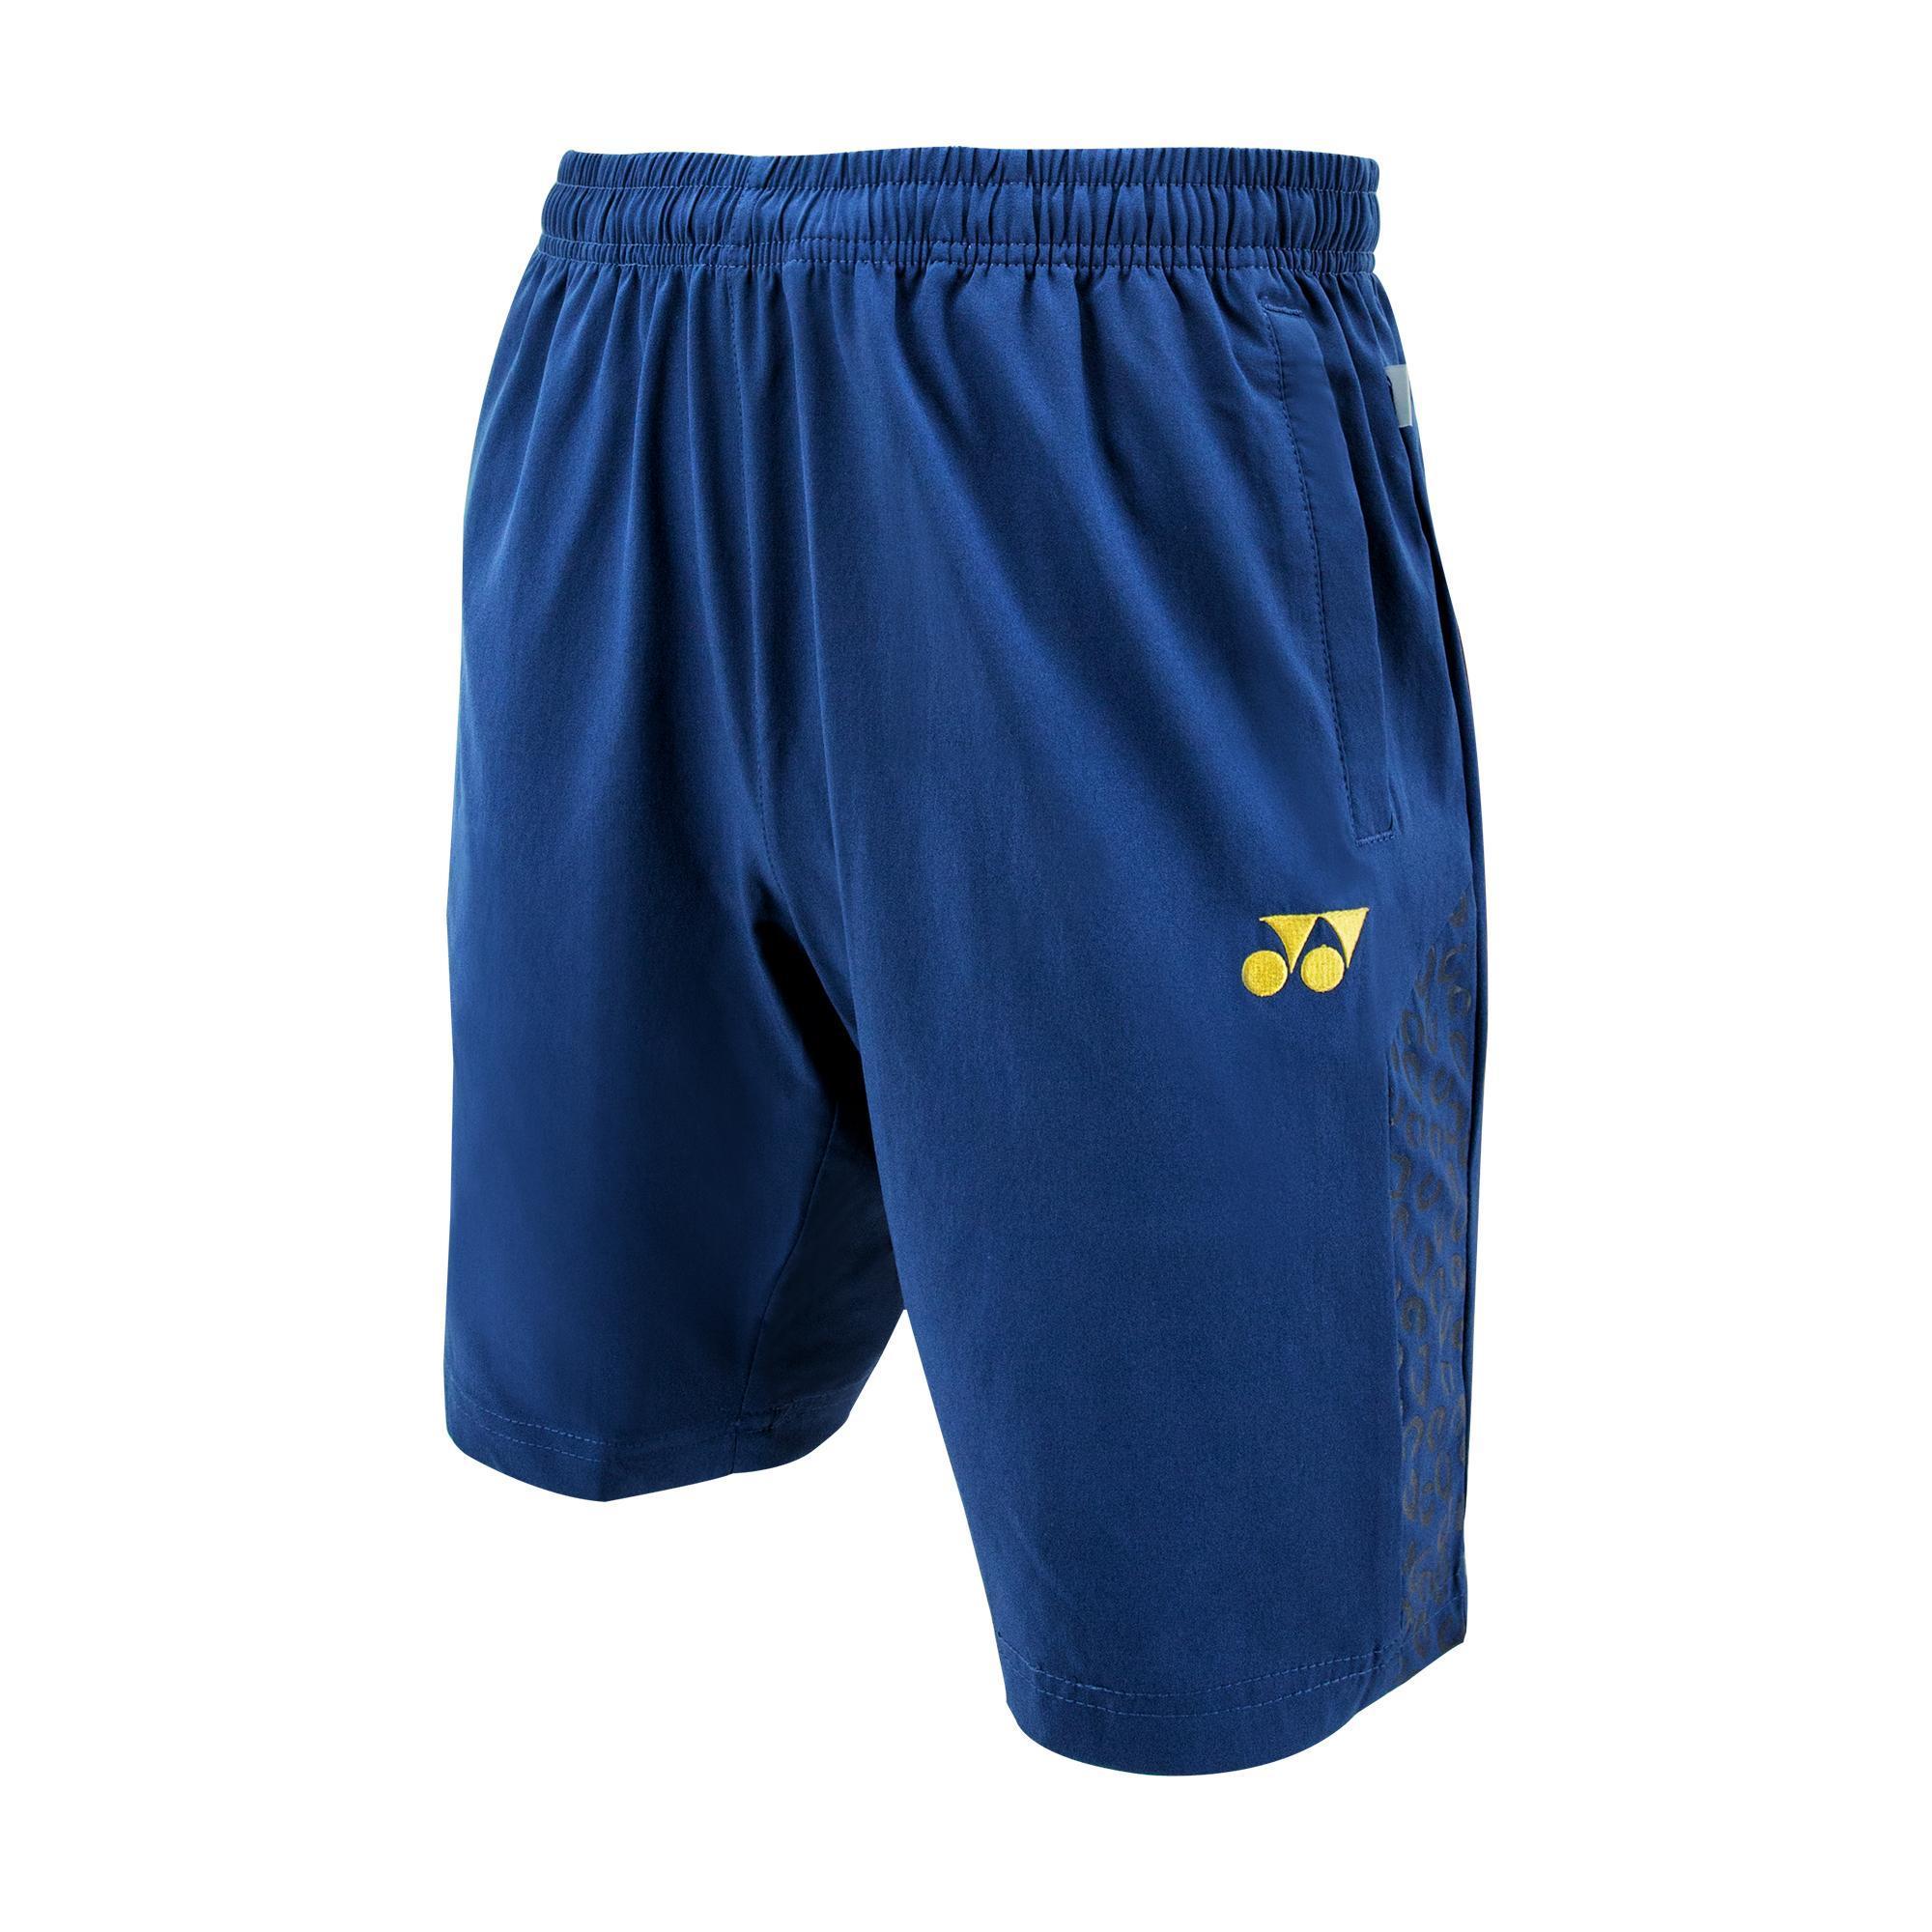 Yonex 2017yonex Permainan I Celana Pendek Bulu Tangkis Eiger 1989 Thanatos Ol Pants Grey Pria Abu 29 Olahraga Woven Tsm60056mv28